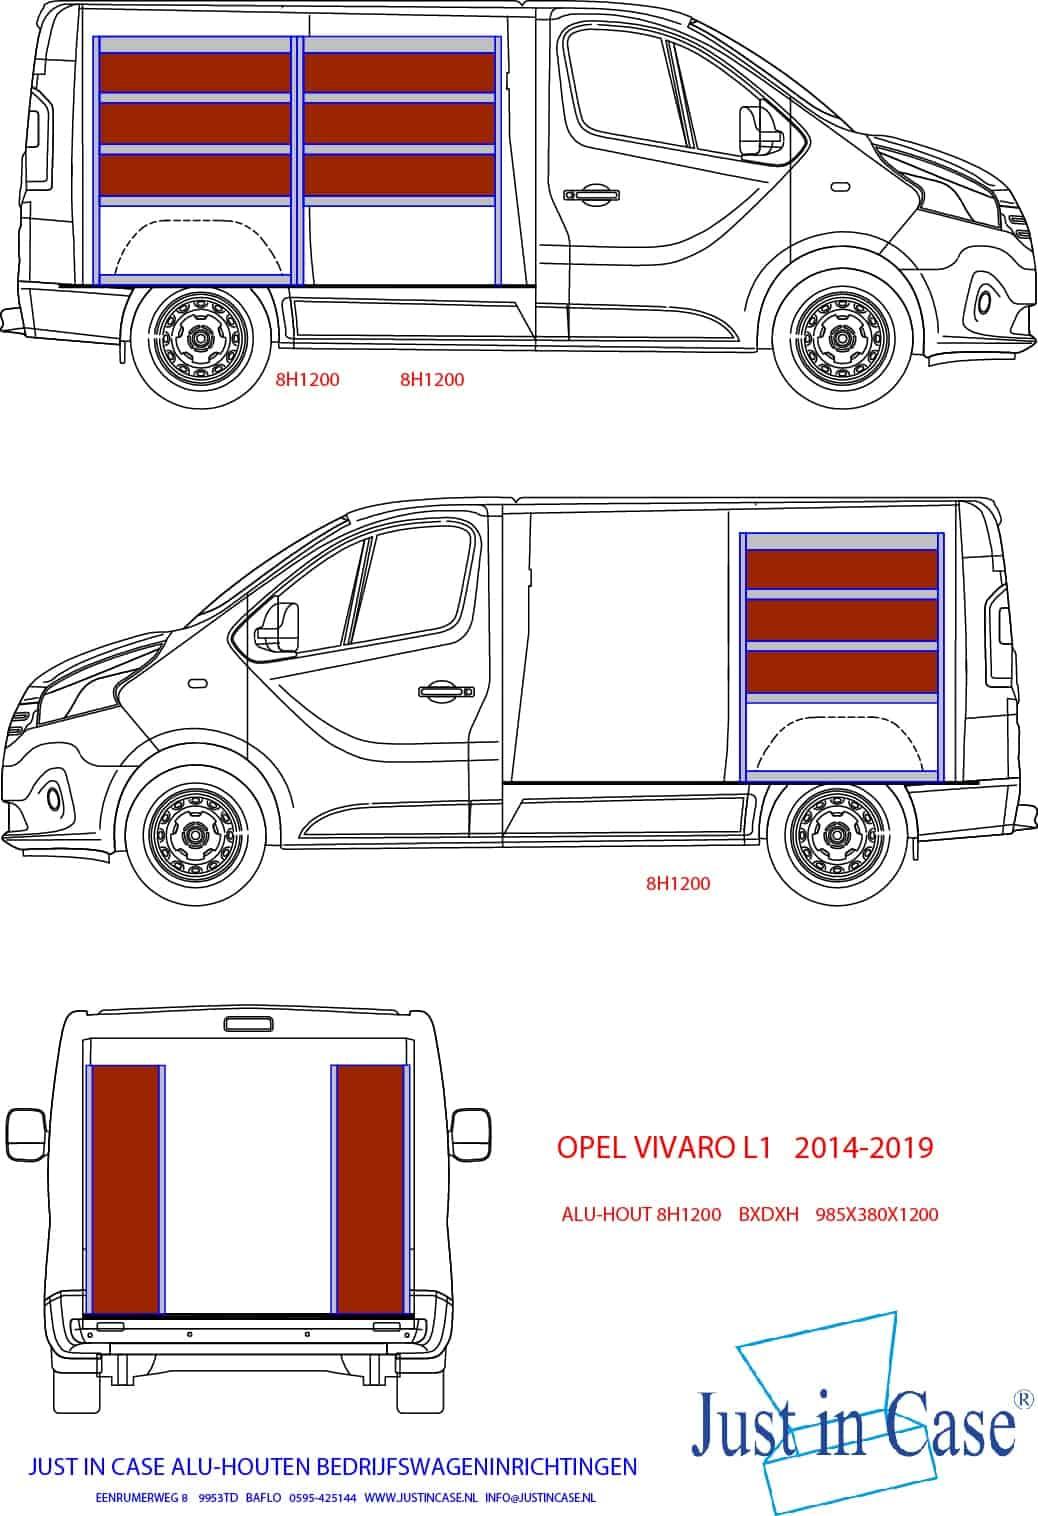 Opel Vivaro (schets)